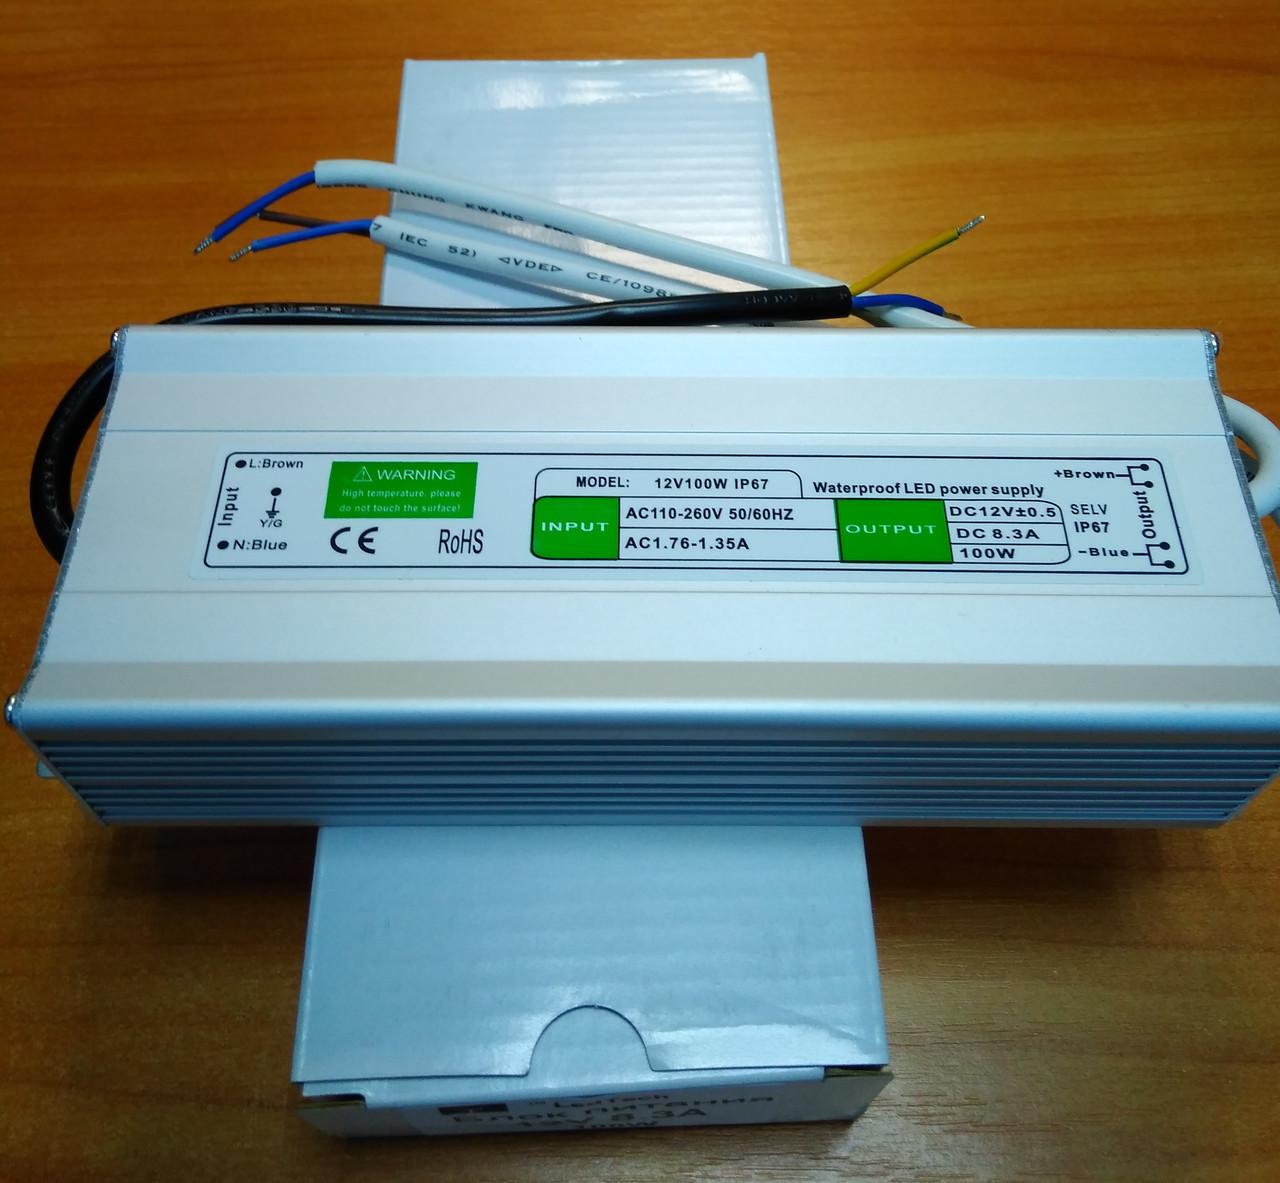 БП герметичный 12V СТАНДАРТ 8,3A 100W IP65 алюминий (LT)